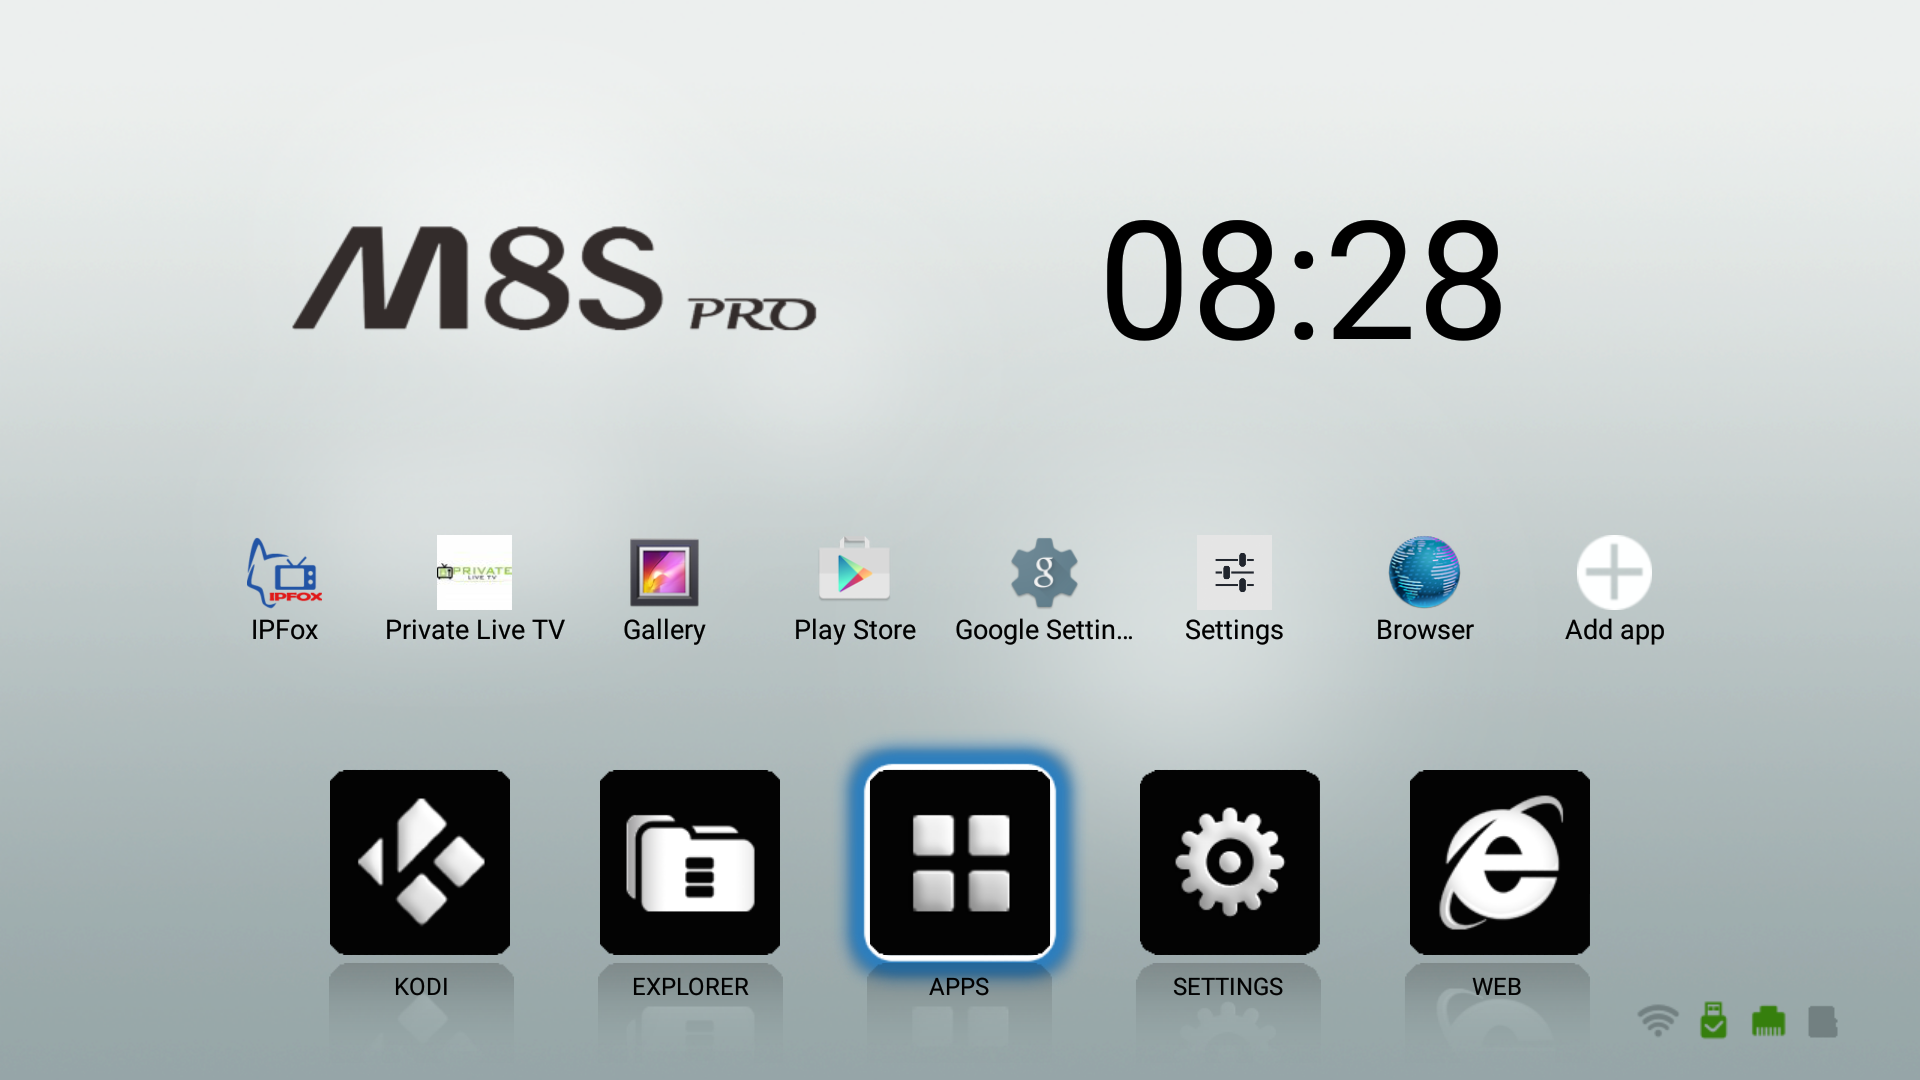 M8s Pro Smart Tv Box Android 7 1 Amlogic S912 Btv Box H 26 Uhd 4kallwinner  A20 Android 4 2 Tv Box Hd Media Player - Buy Allwinner A20 Android 4 2 Tv